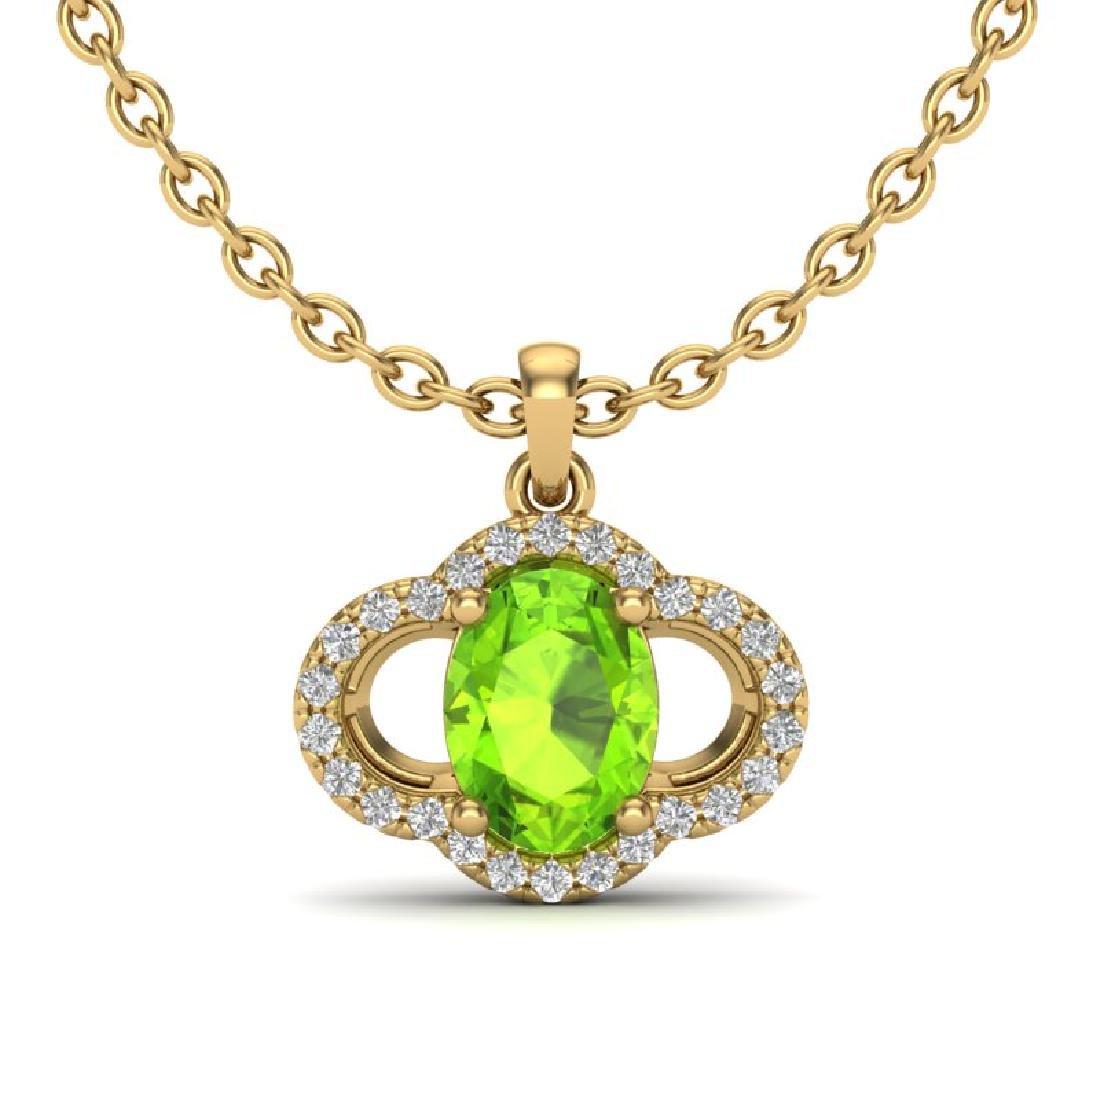 1.75 CTW Peridot & Micro Pave VS/SI Diamond Necklace